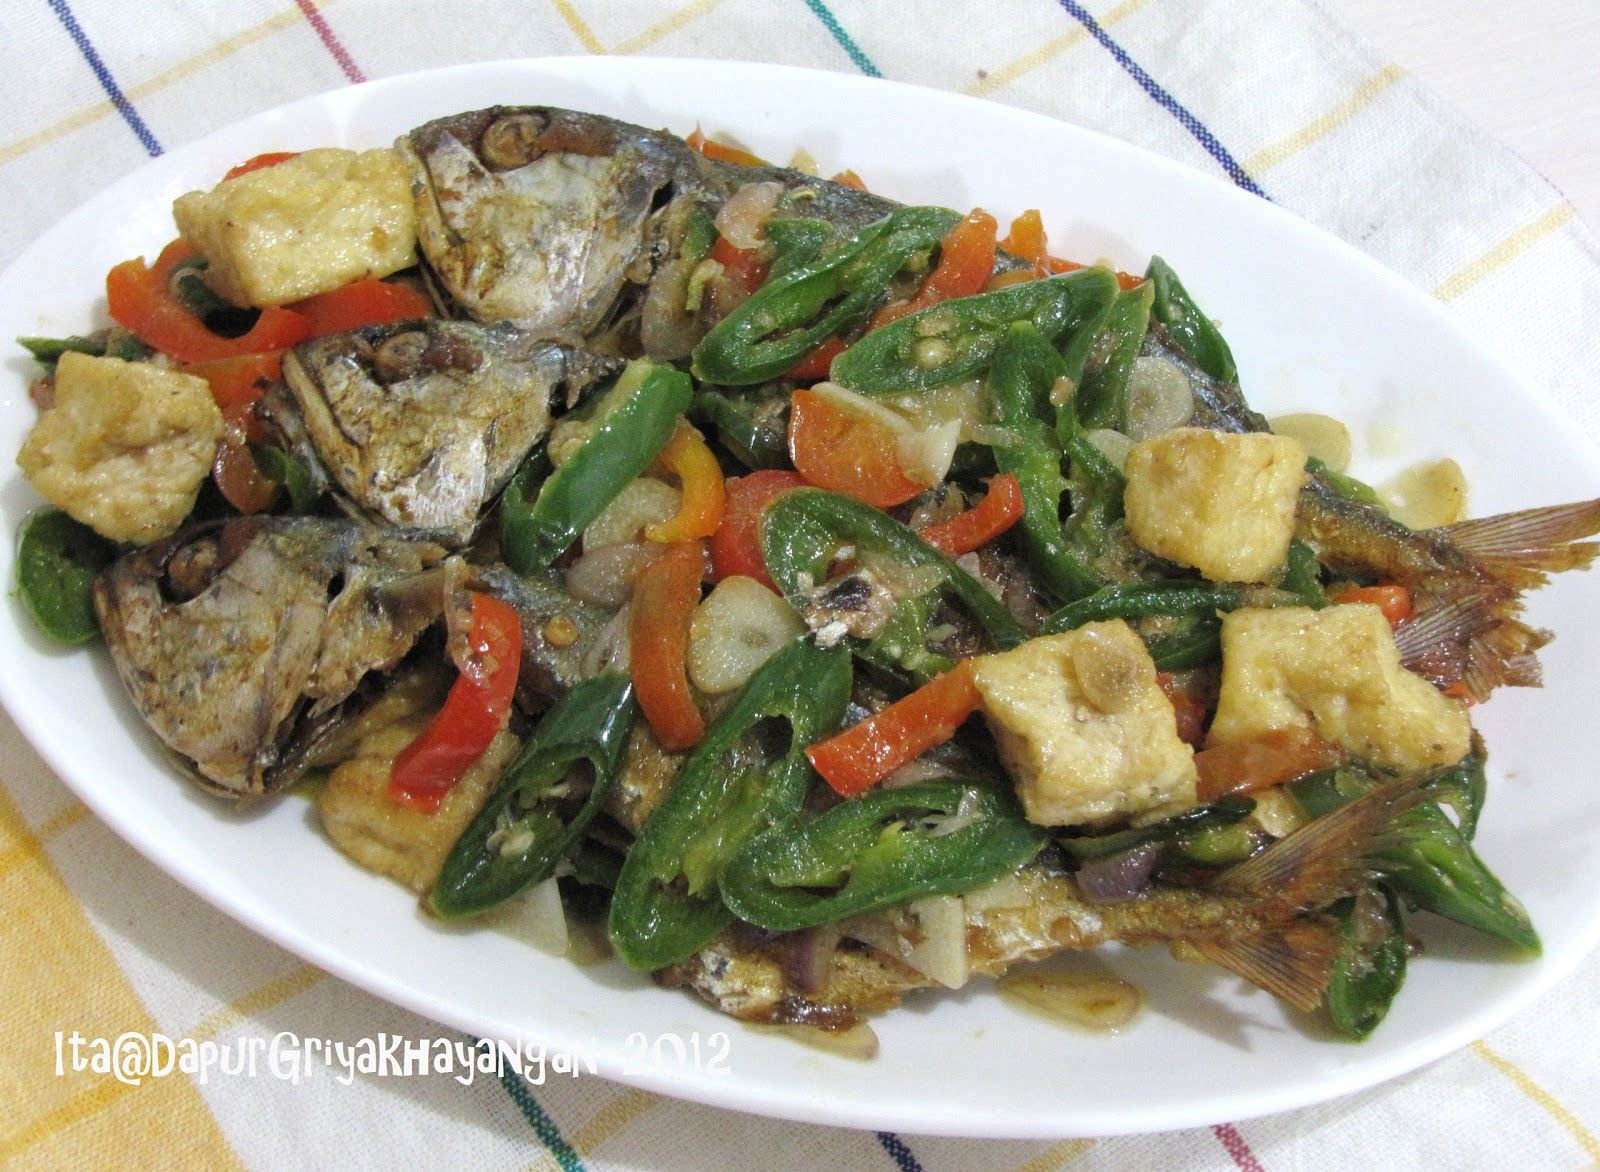 Dapur Griya Khayangan Tumis Ikan Asin Peda Cabe Ijo